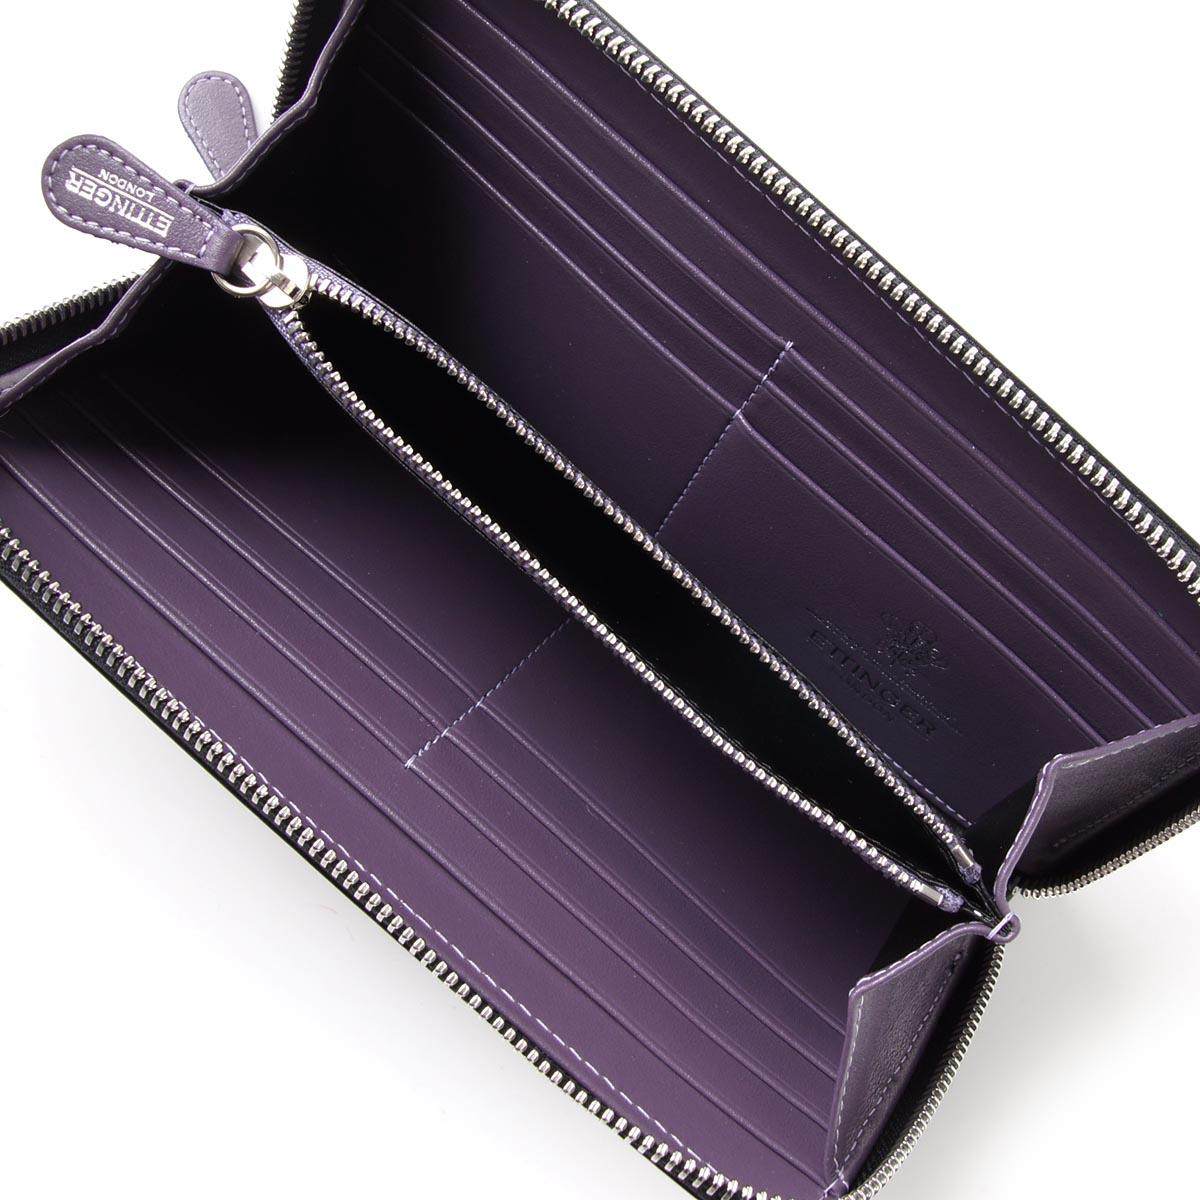 Ettinger ETTINGER round fastener long wallet [with the coin purse] royal collection BLACK X PURPLE black system st2051ejr men